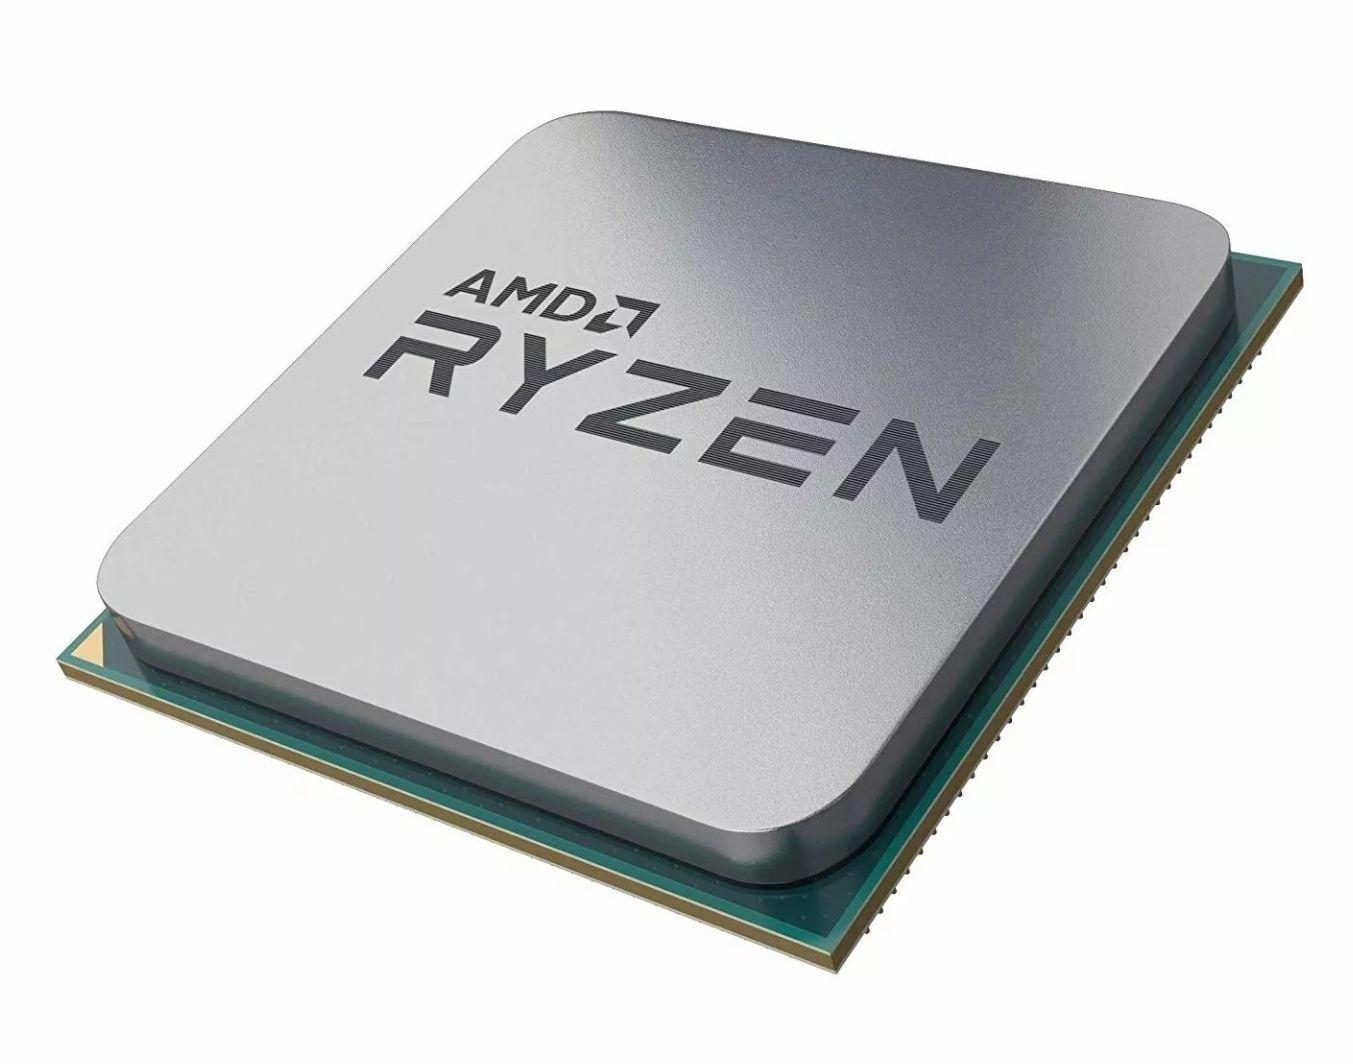 AMD Ryzen 9 3900 CPU Twelve Core 4.3GHz Processor Socket AM4 - OEM - £439.95 From Hyper-UK / Ebay